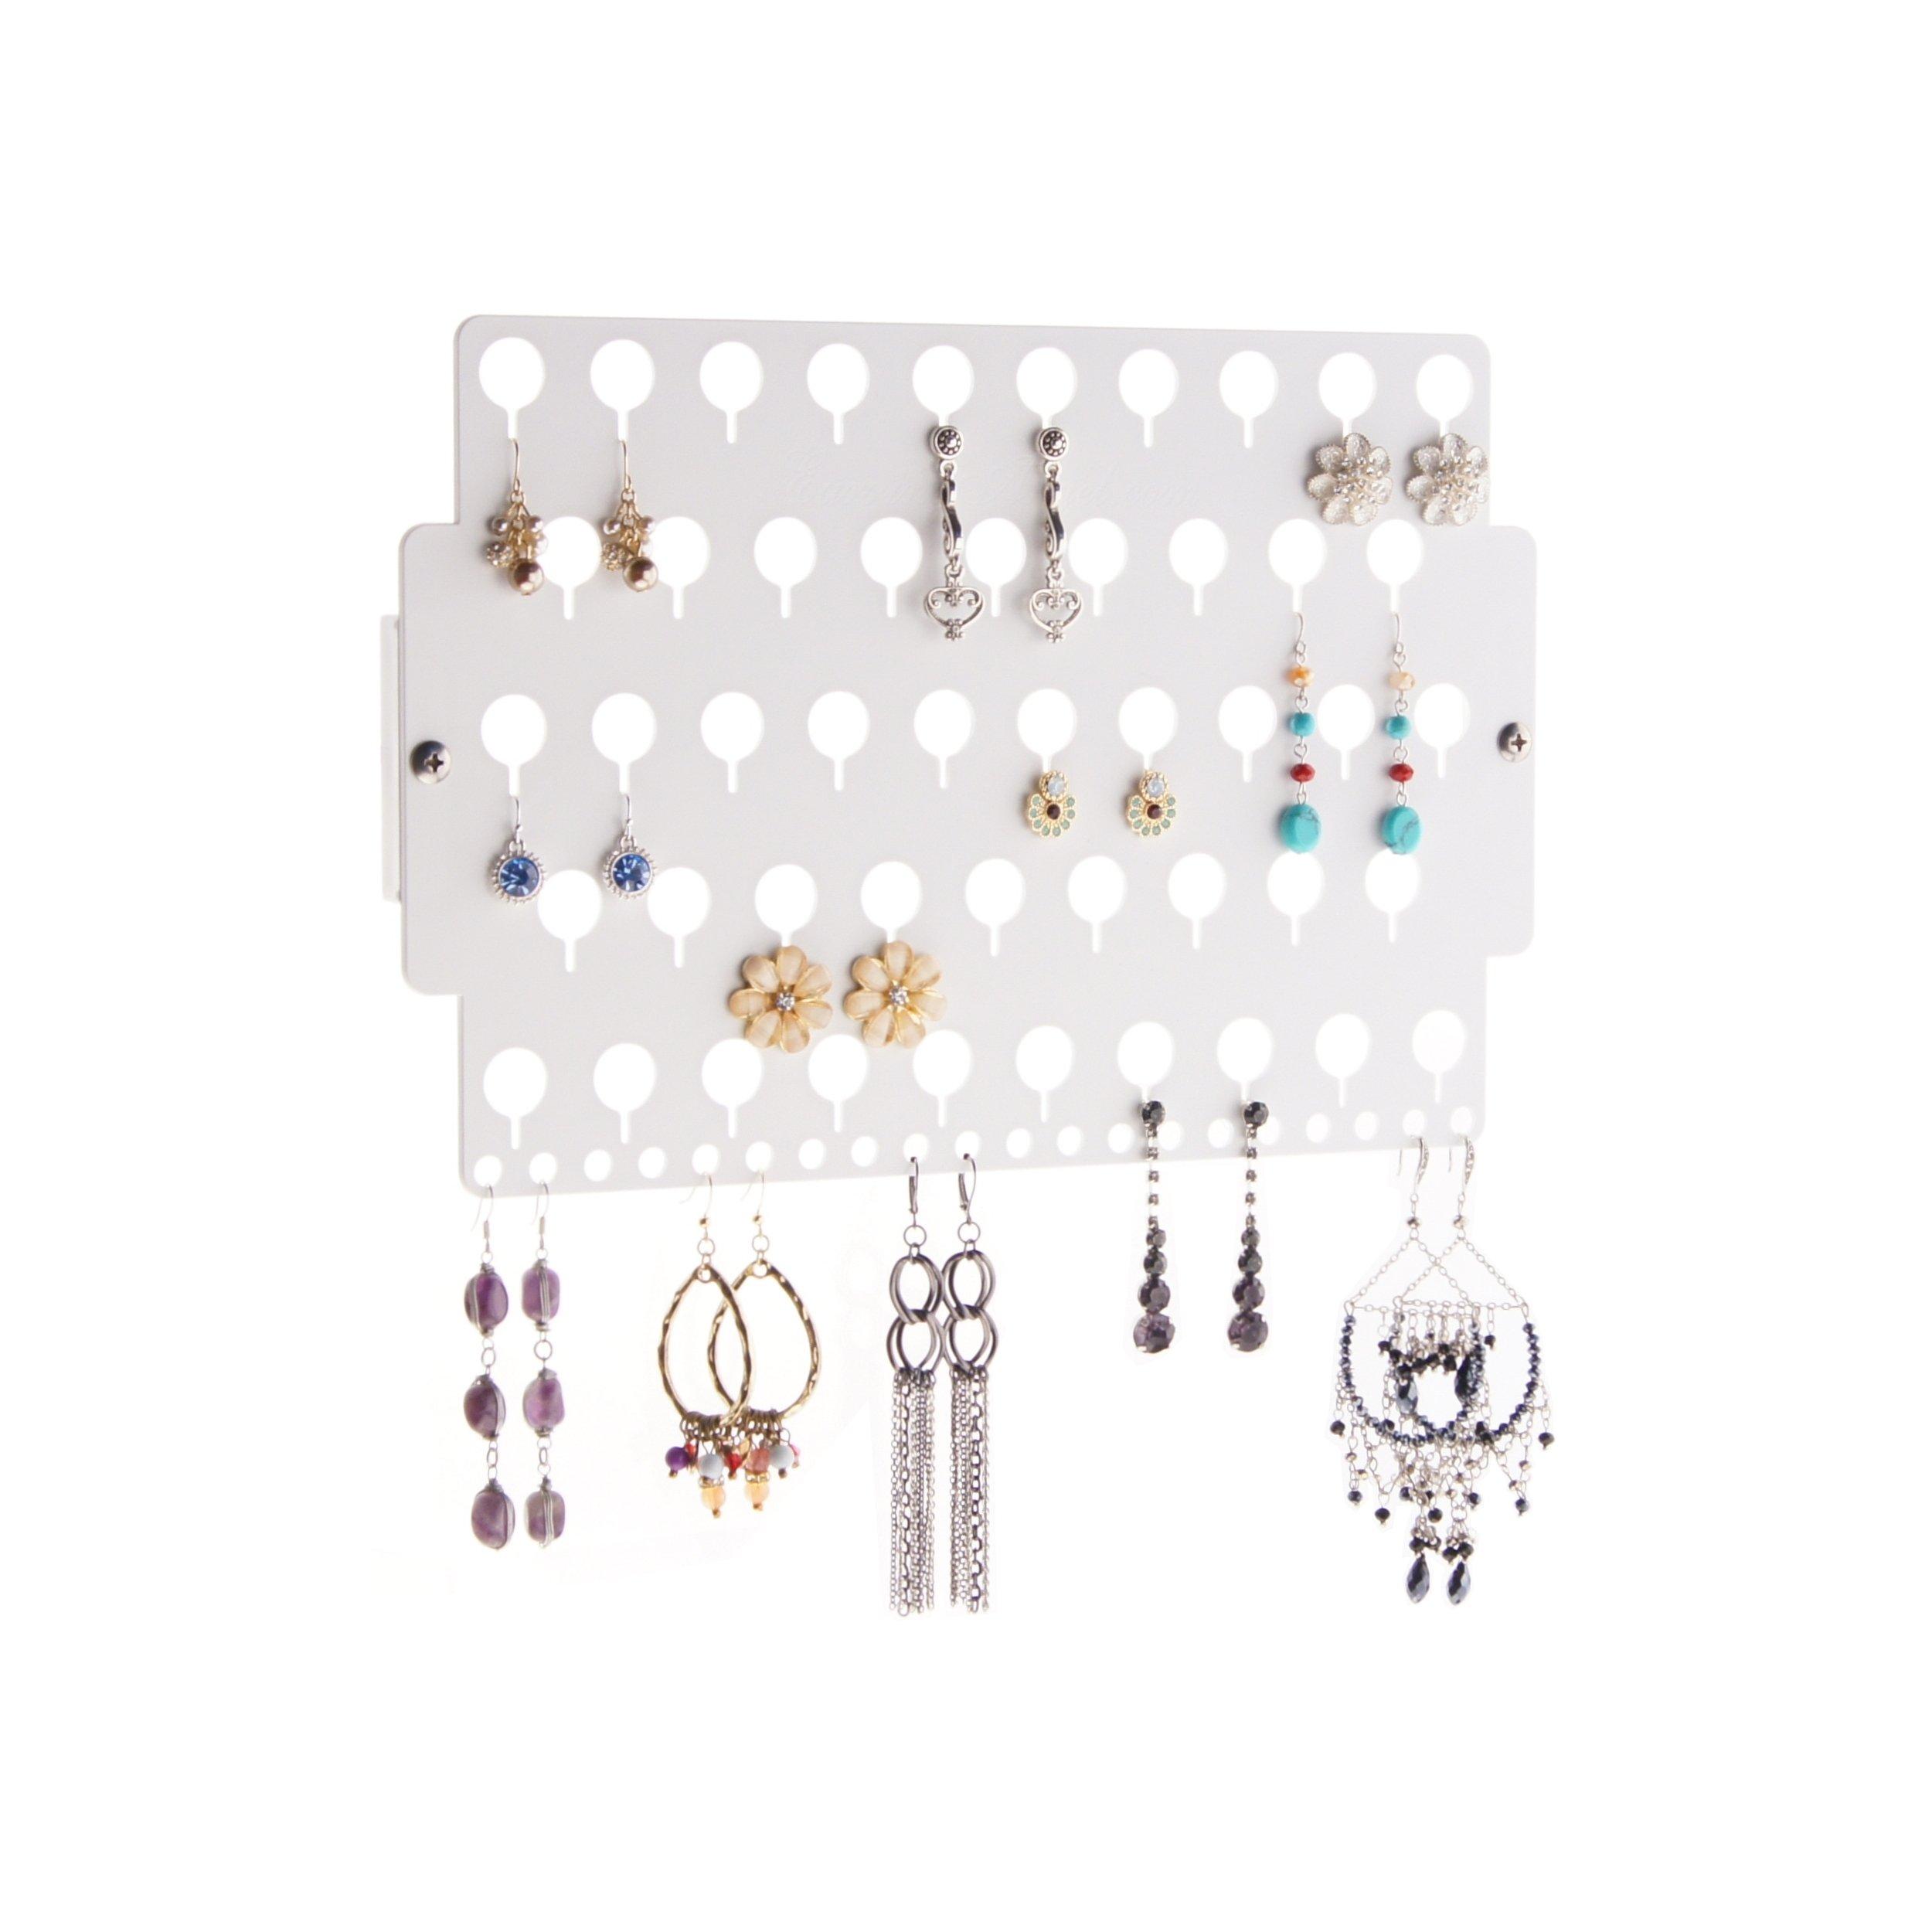 Angelynn's Wall Earring Holder Organizer Jewelry Storage Rack, Earring Angel White